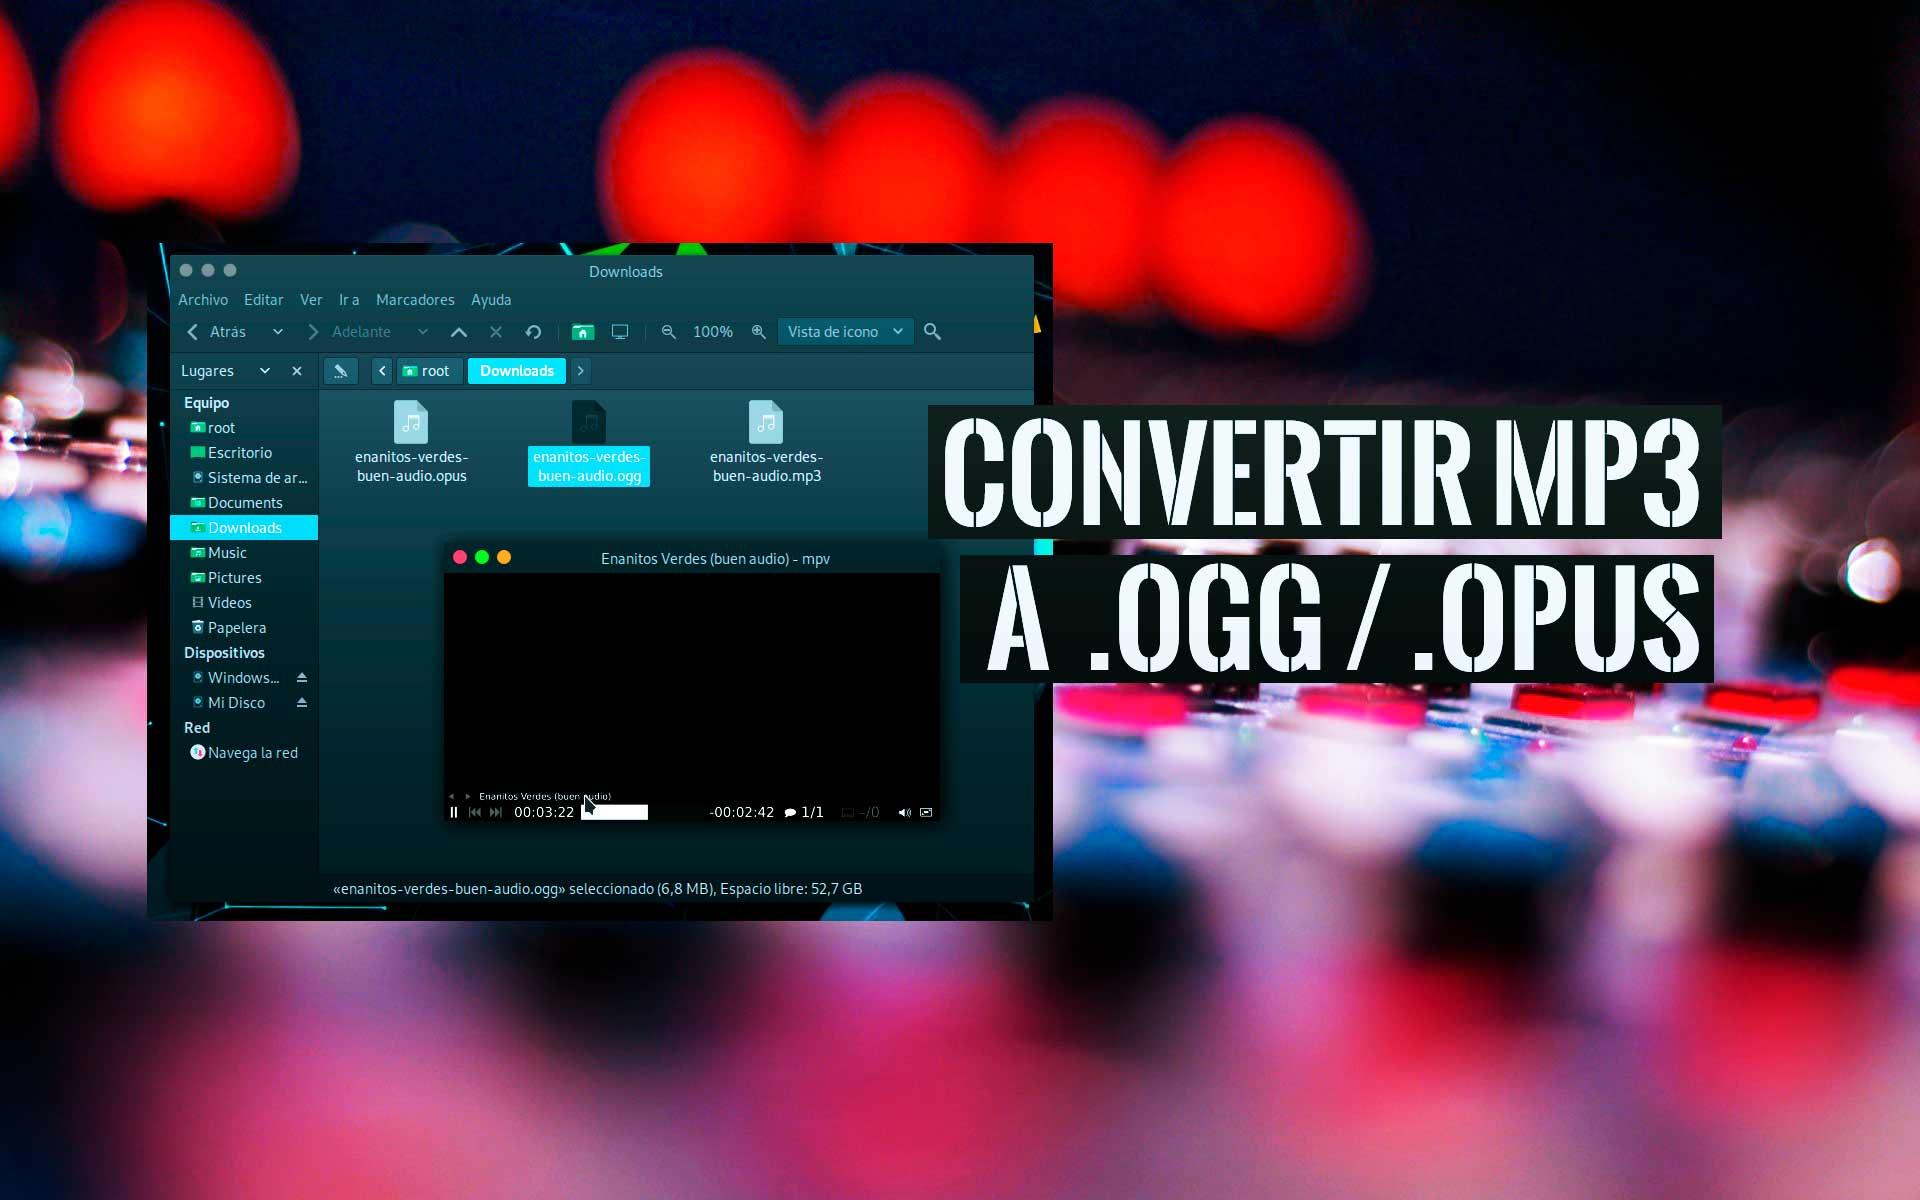 Convertir archivos música MP3 a ogg opus Linux